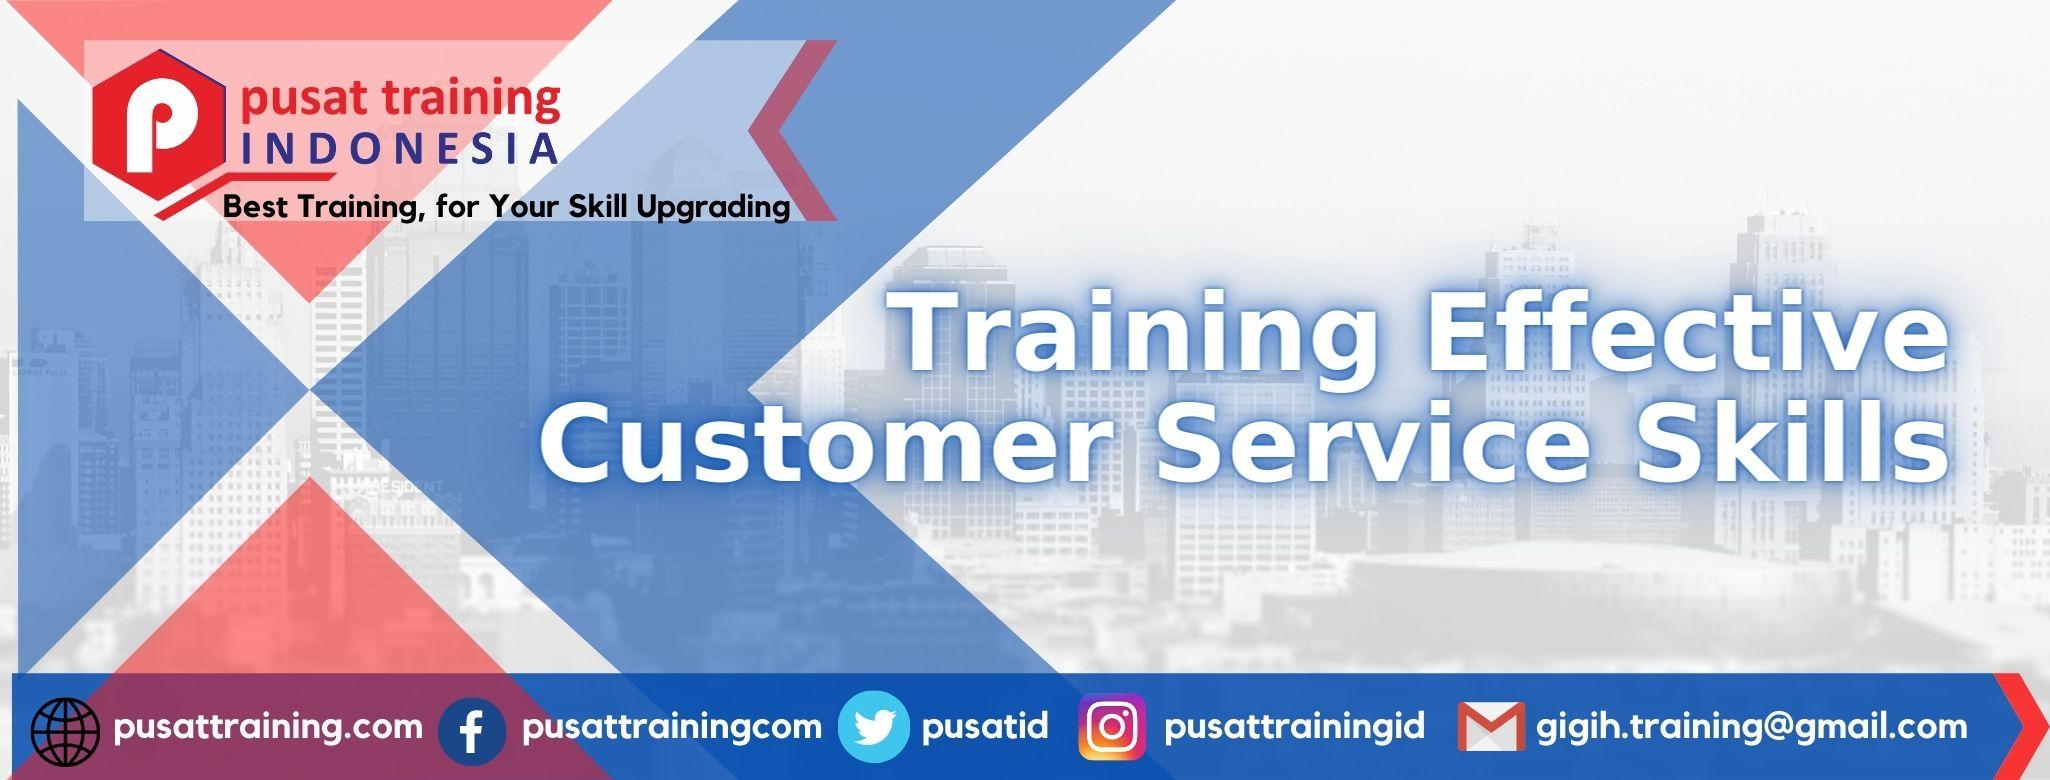 Training-Effective-Customer-Service-Skills